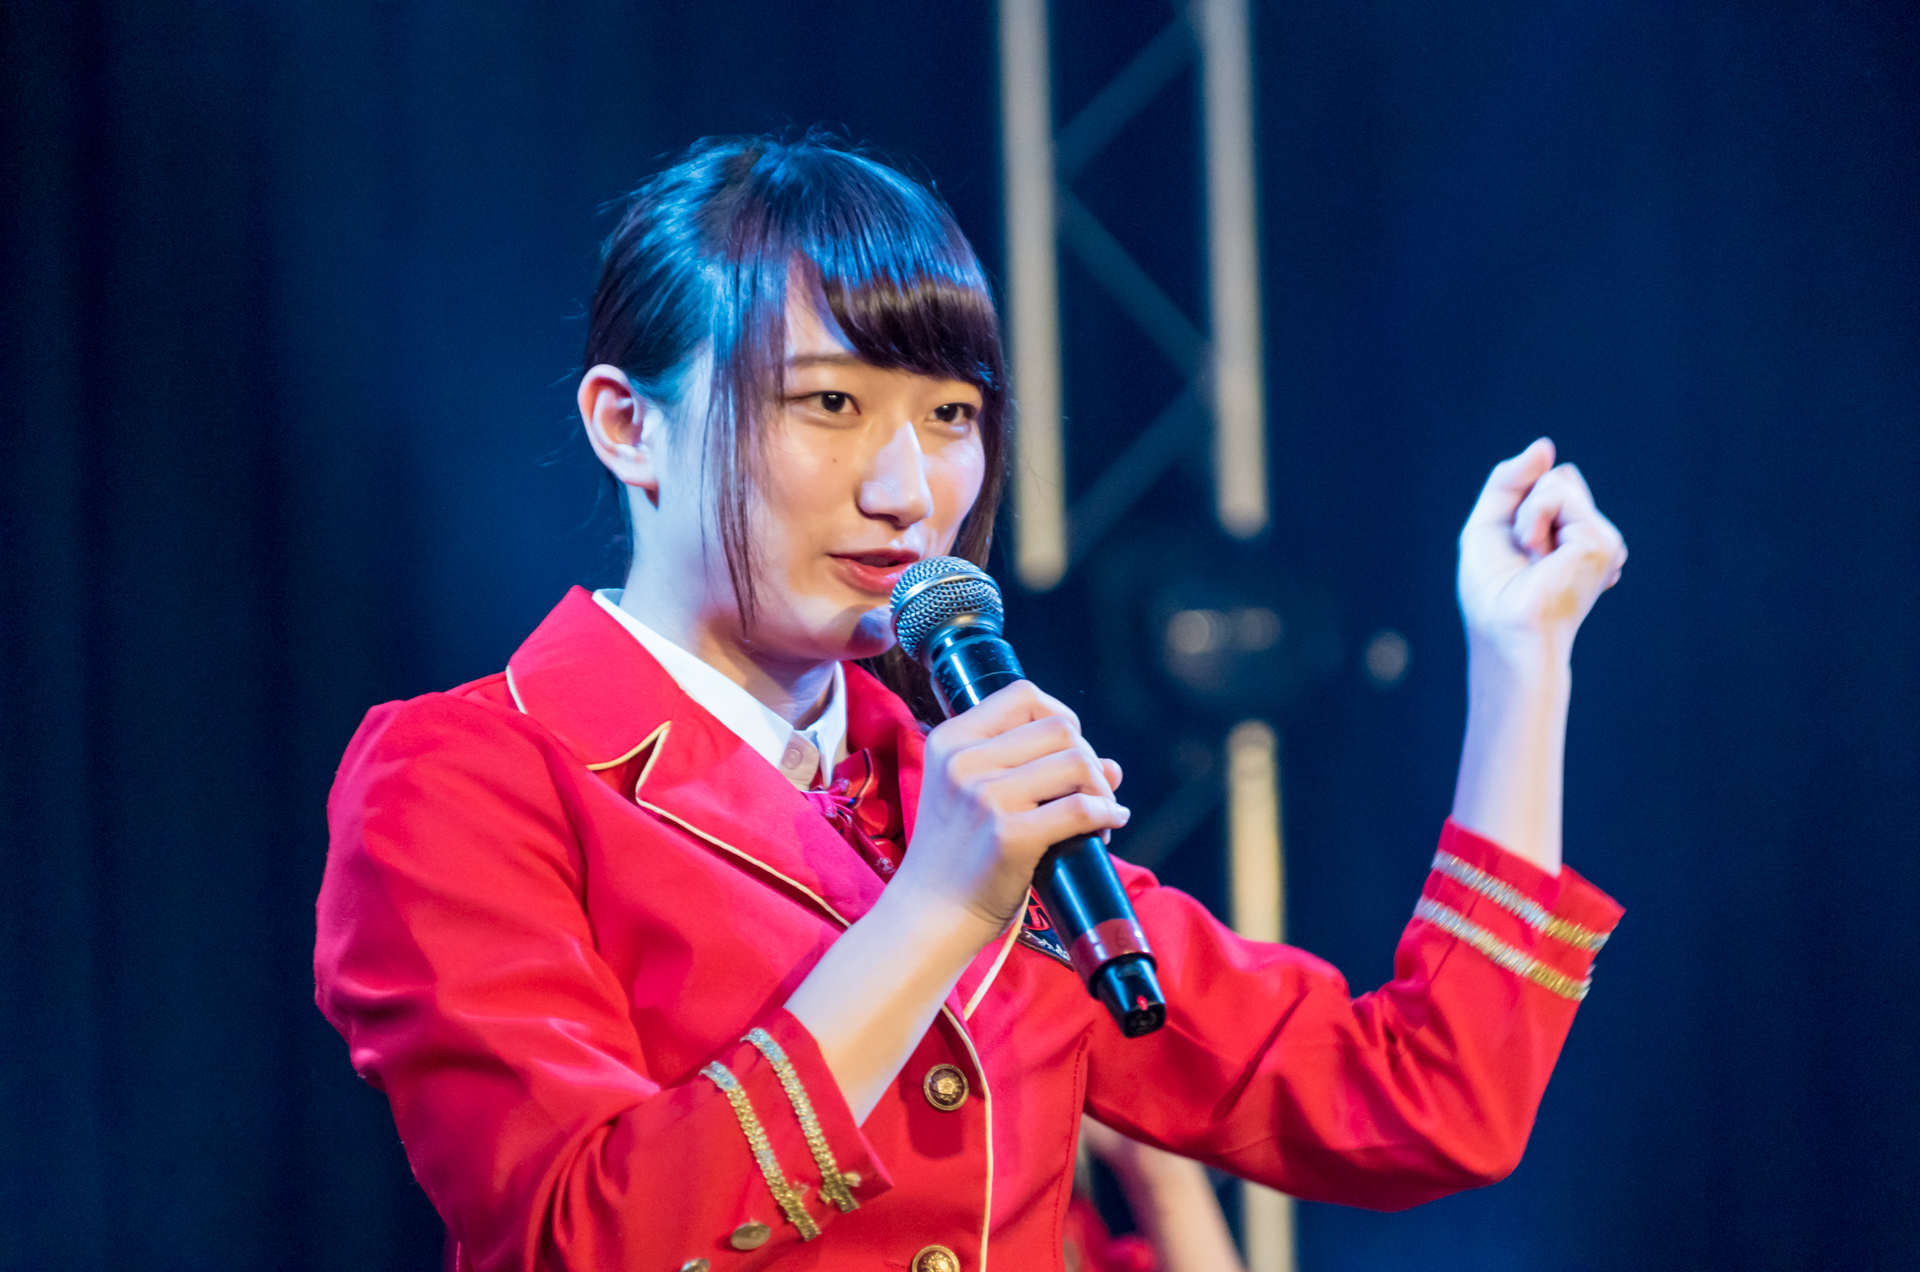 Teamくれれっ娘! 信野樹奈 | クレレコアイドル見本市